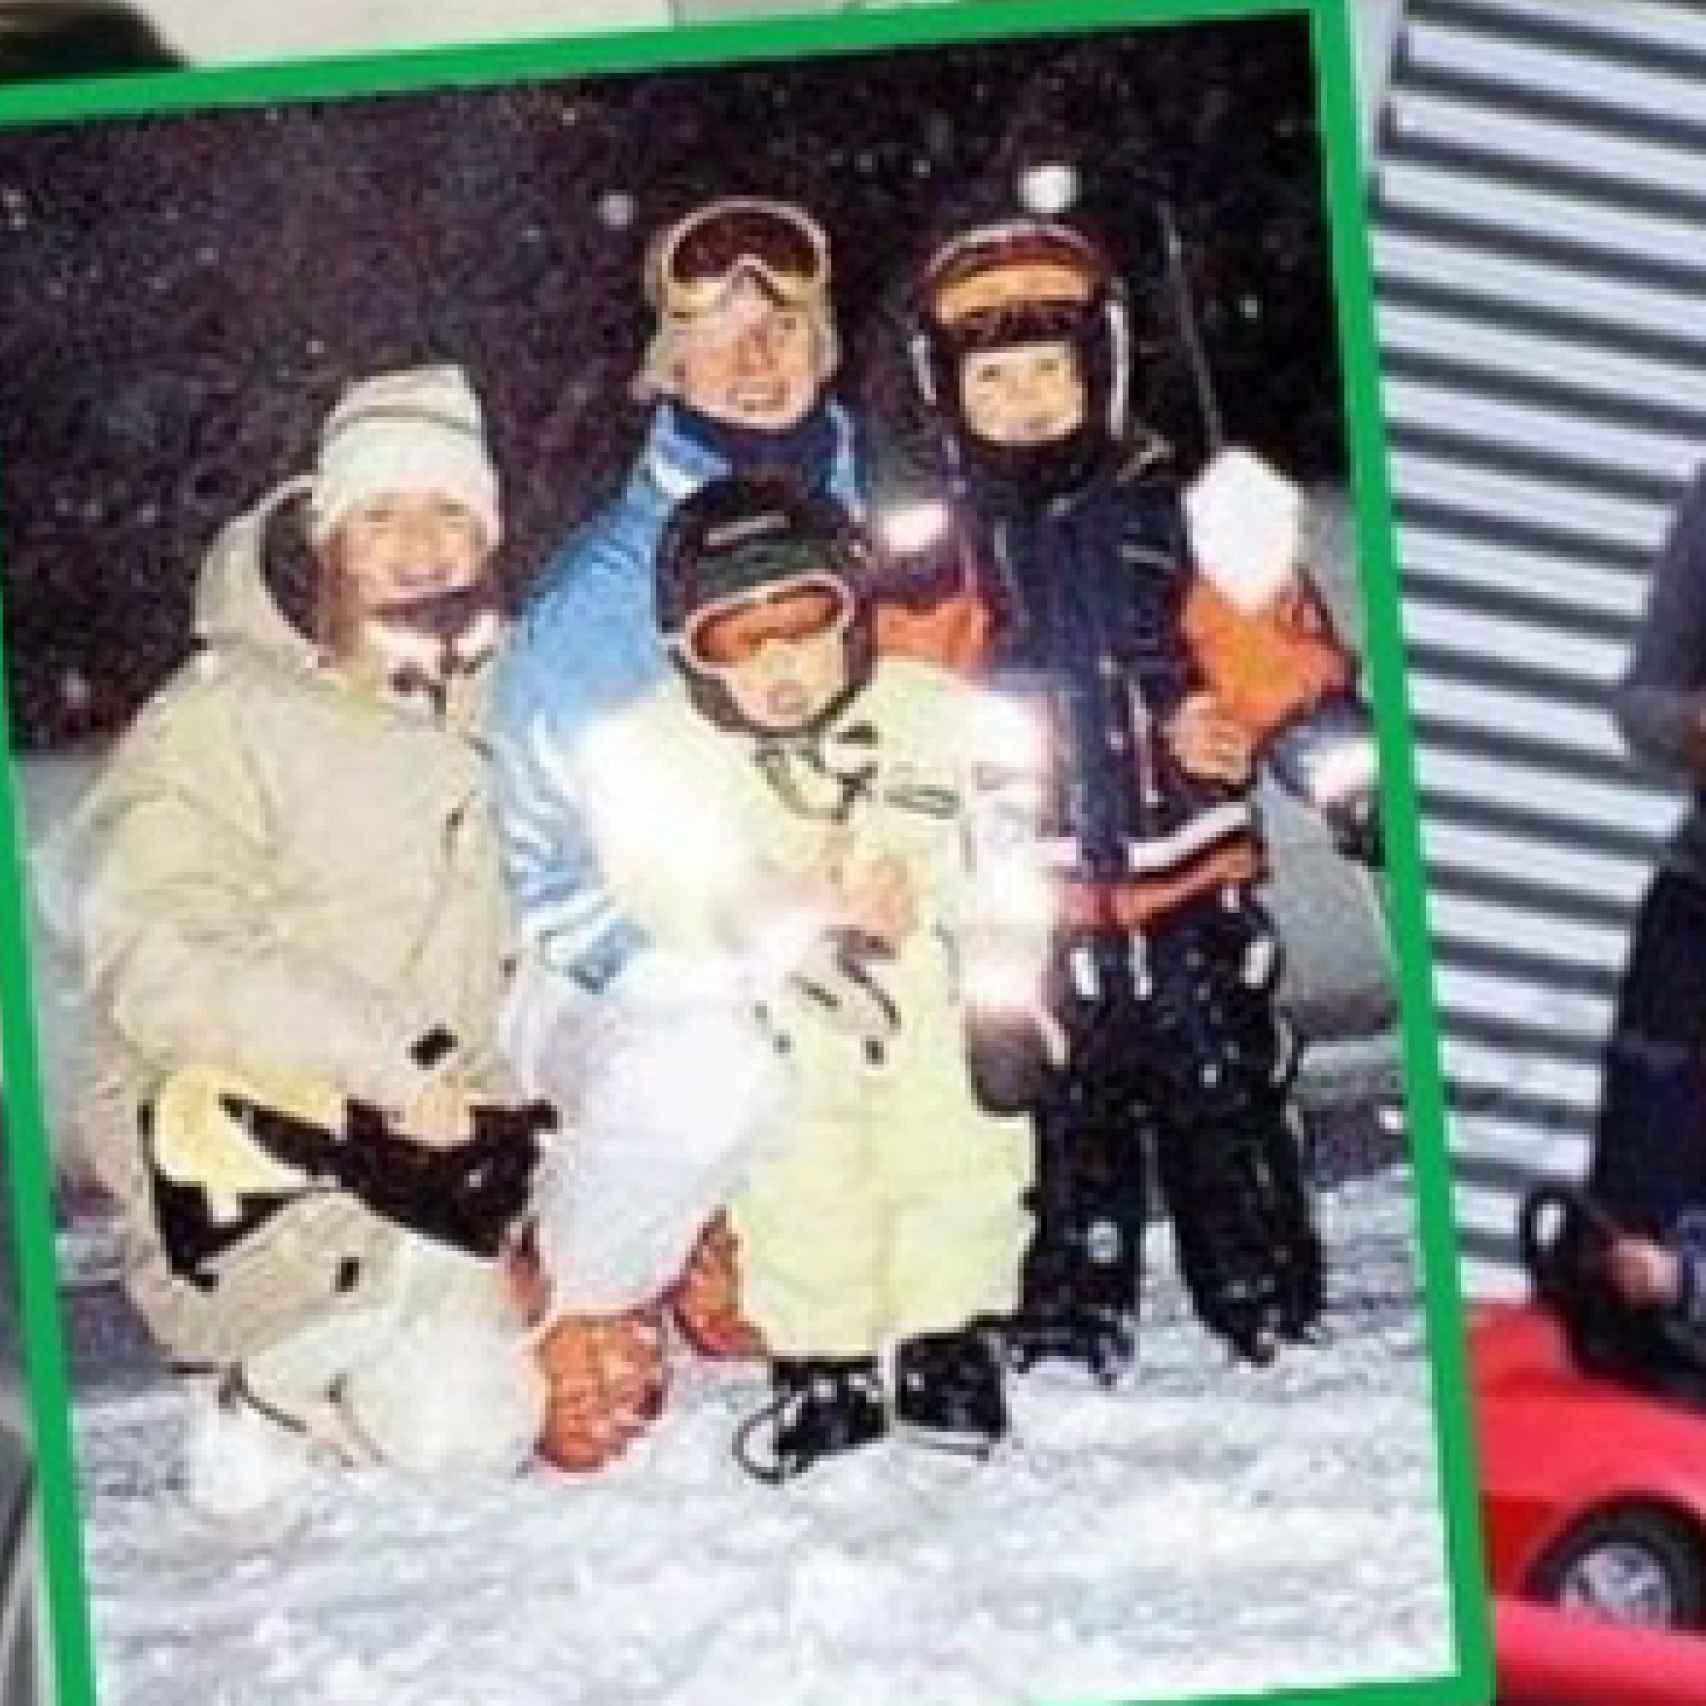 La familia Schumacher era muy aficionada al esquí